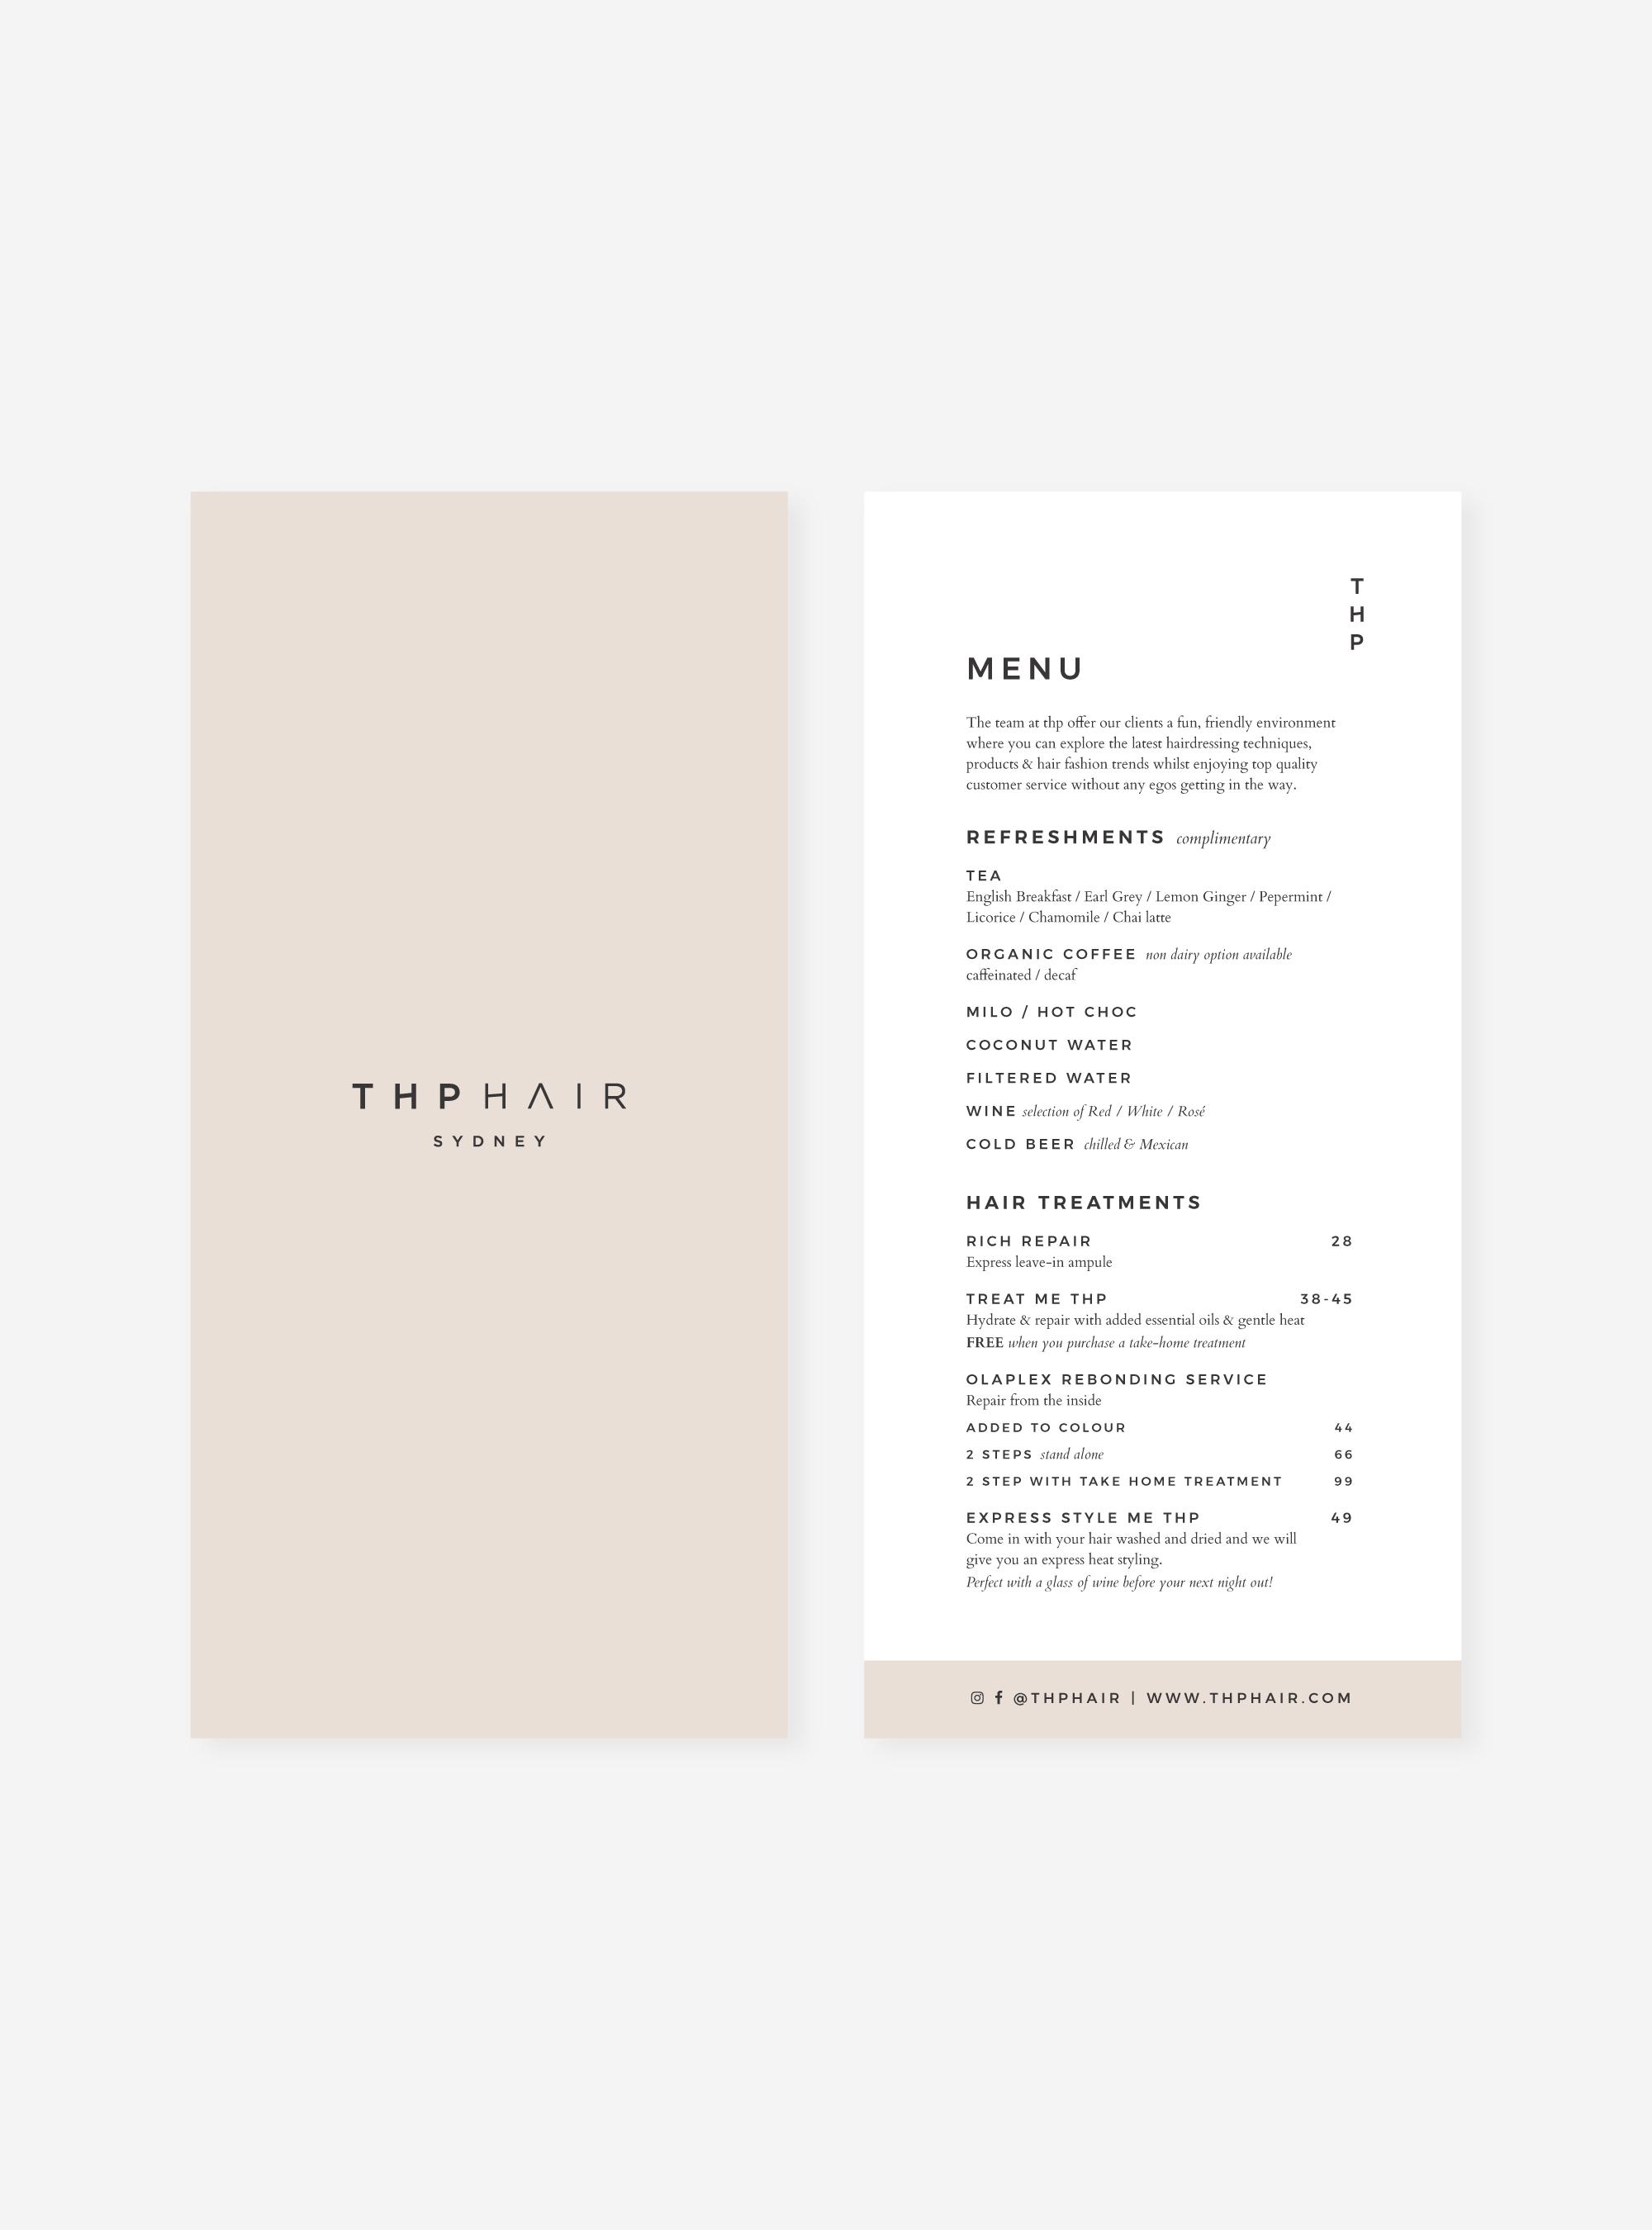 thp-menu.jpg